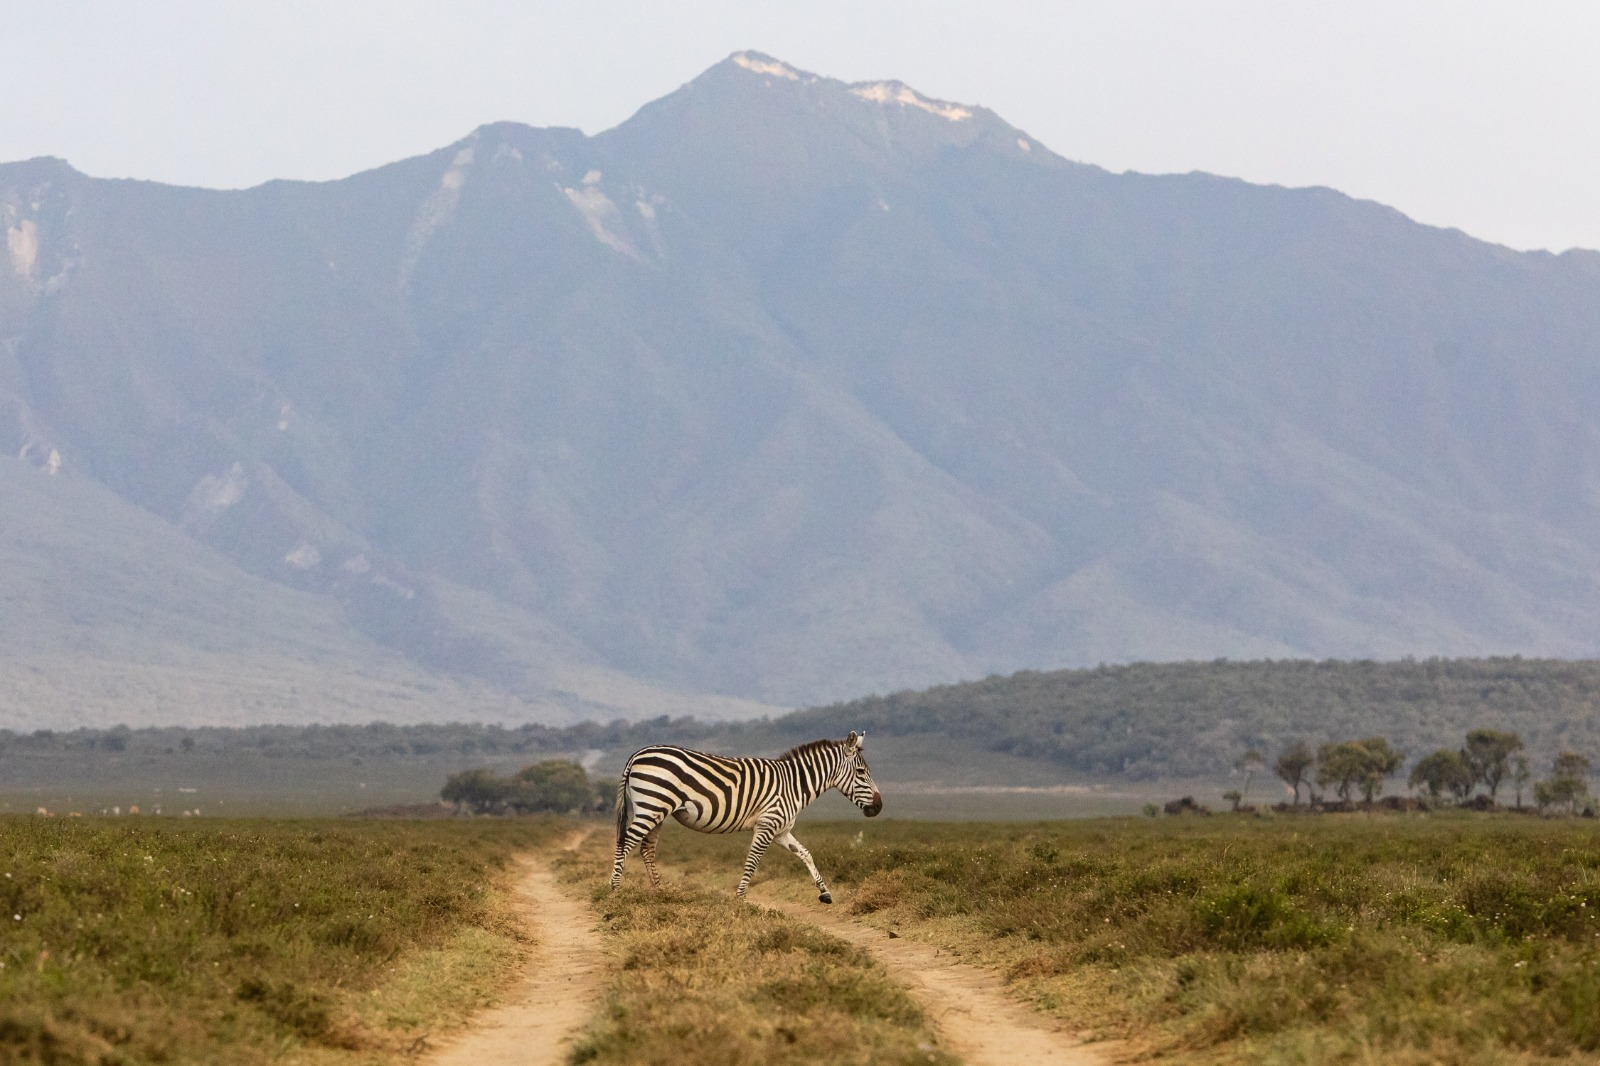 WRC: Safari Rally Kenya [23-27 Junio] - Página 2 E4gmtt3XEAAiF0_?format=jpg&name=large